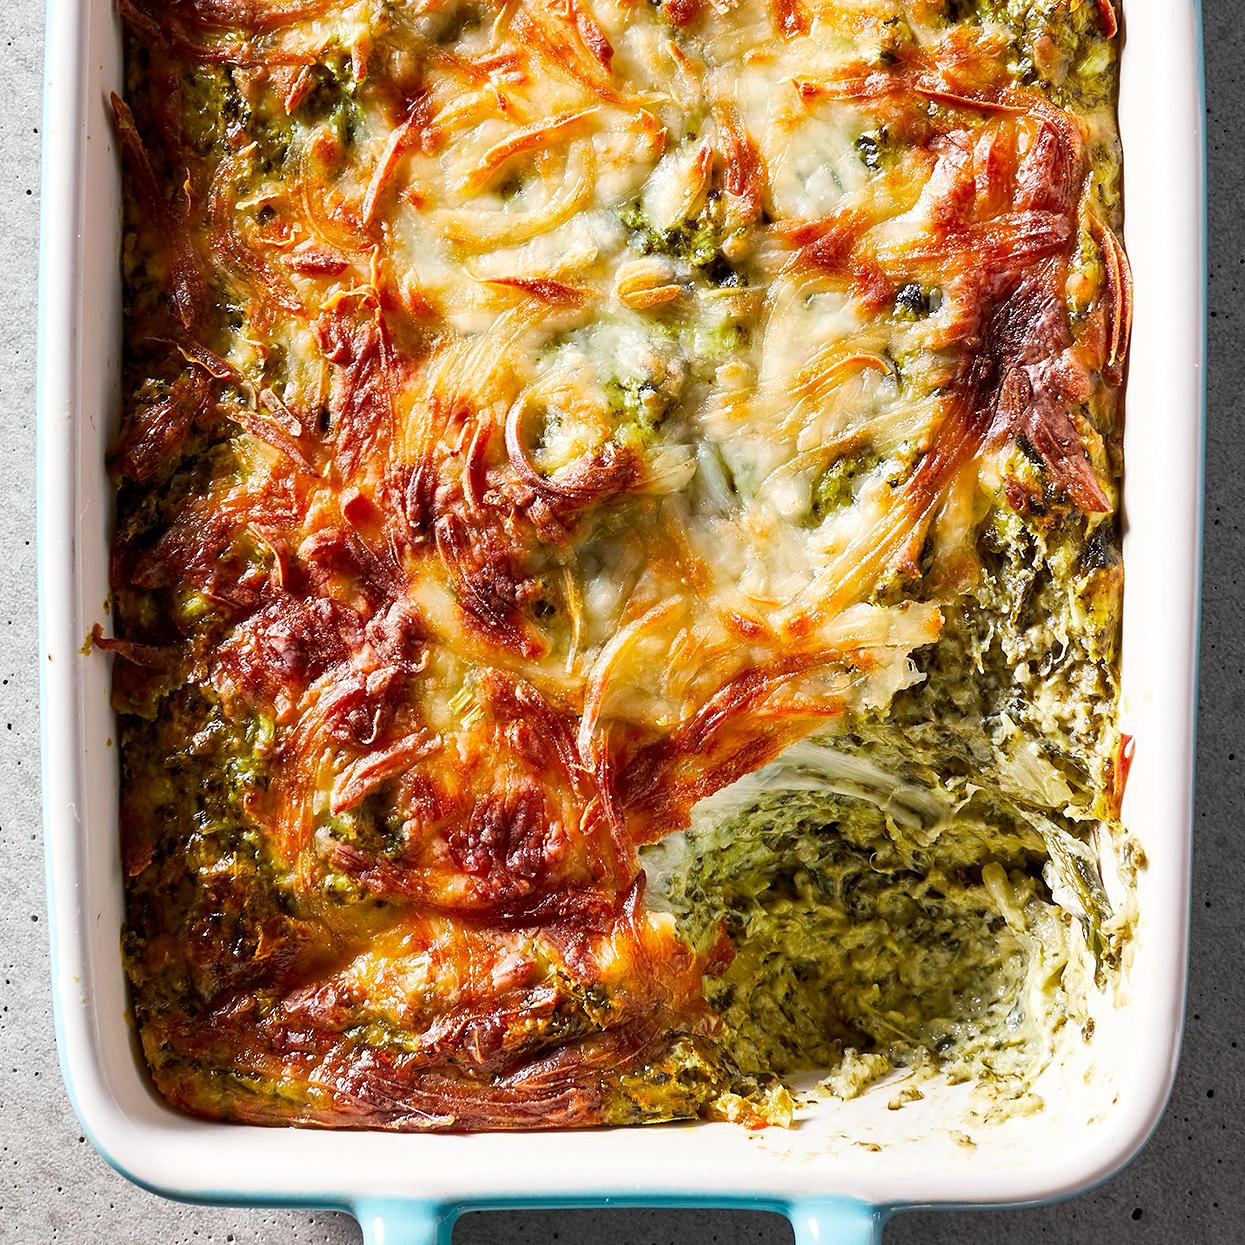 Warm Spinach-Artichoke Dip